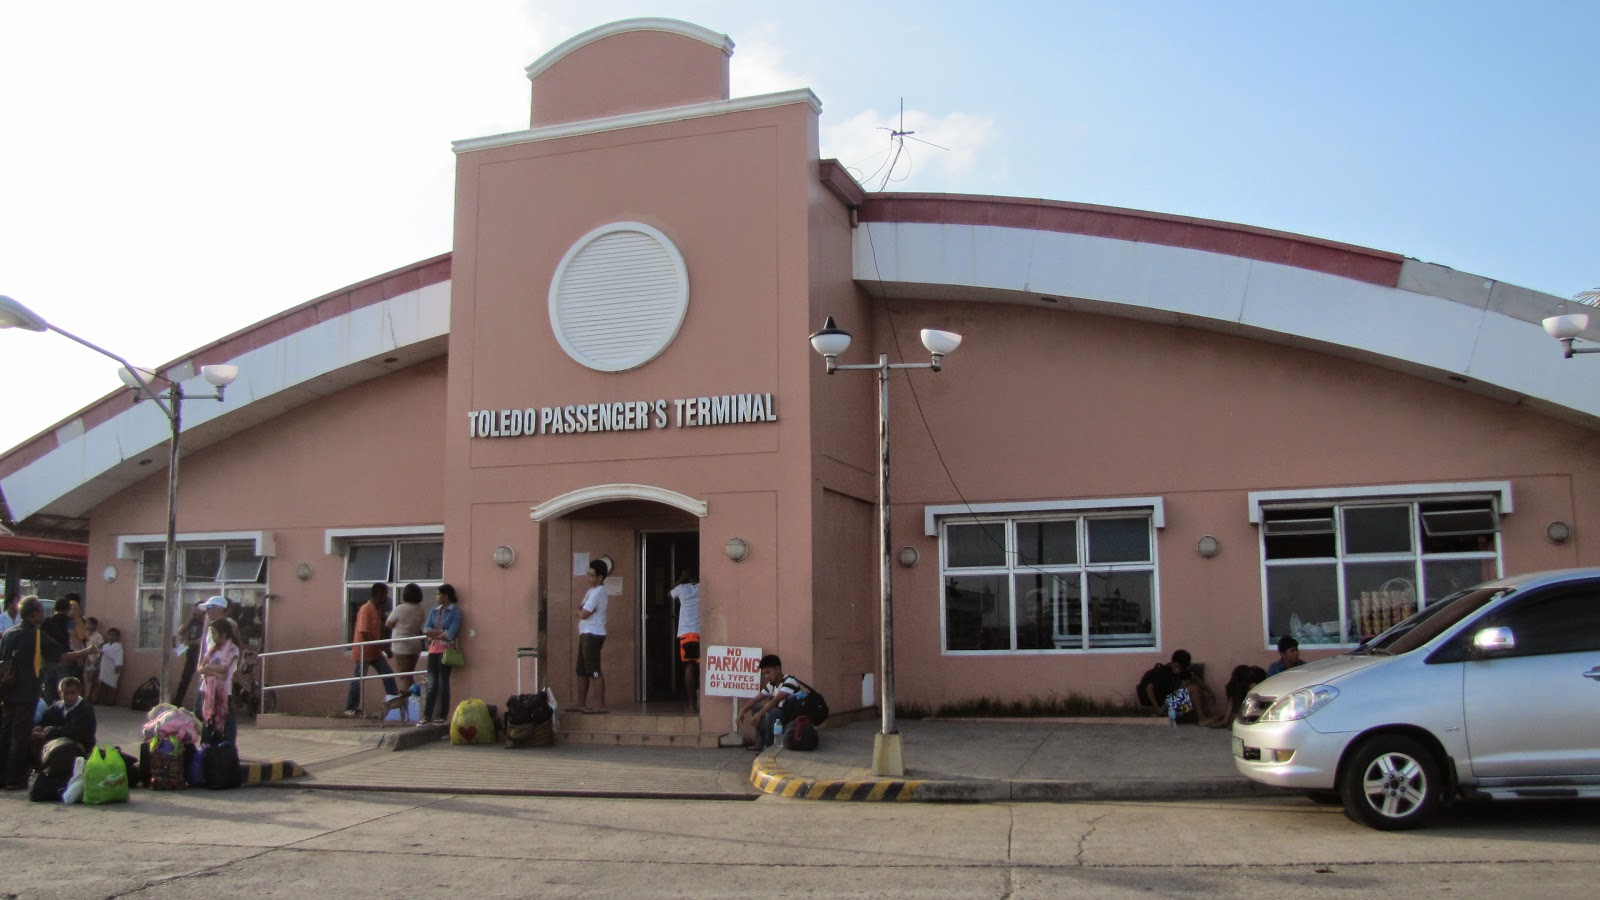 FTW! Travels, bacolod trip, local trip, Toledo Passenger's Terminal